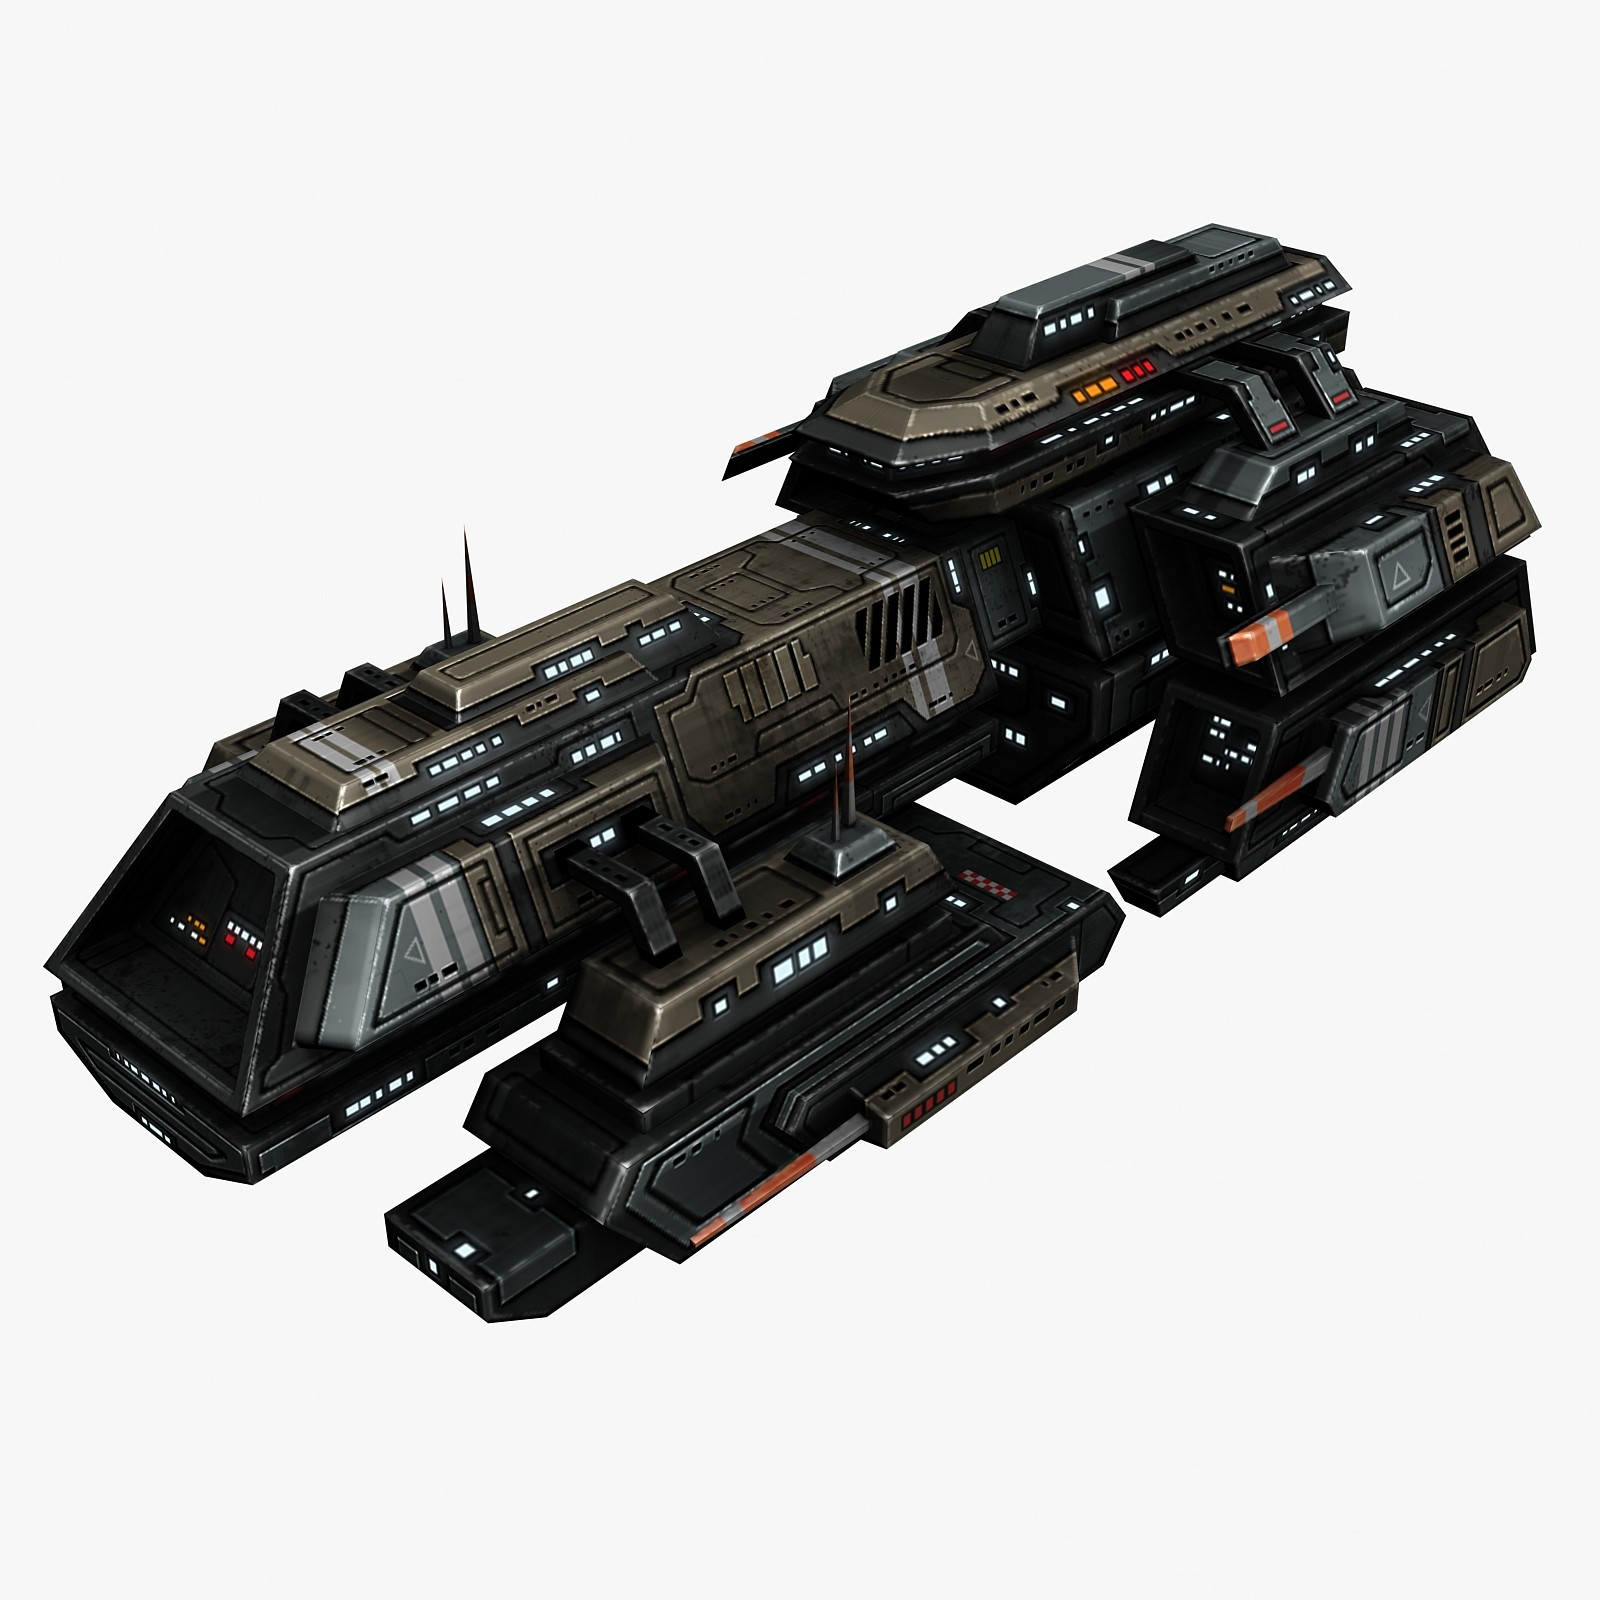 spaceship_frigate_1_preview_1.jpg